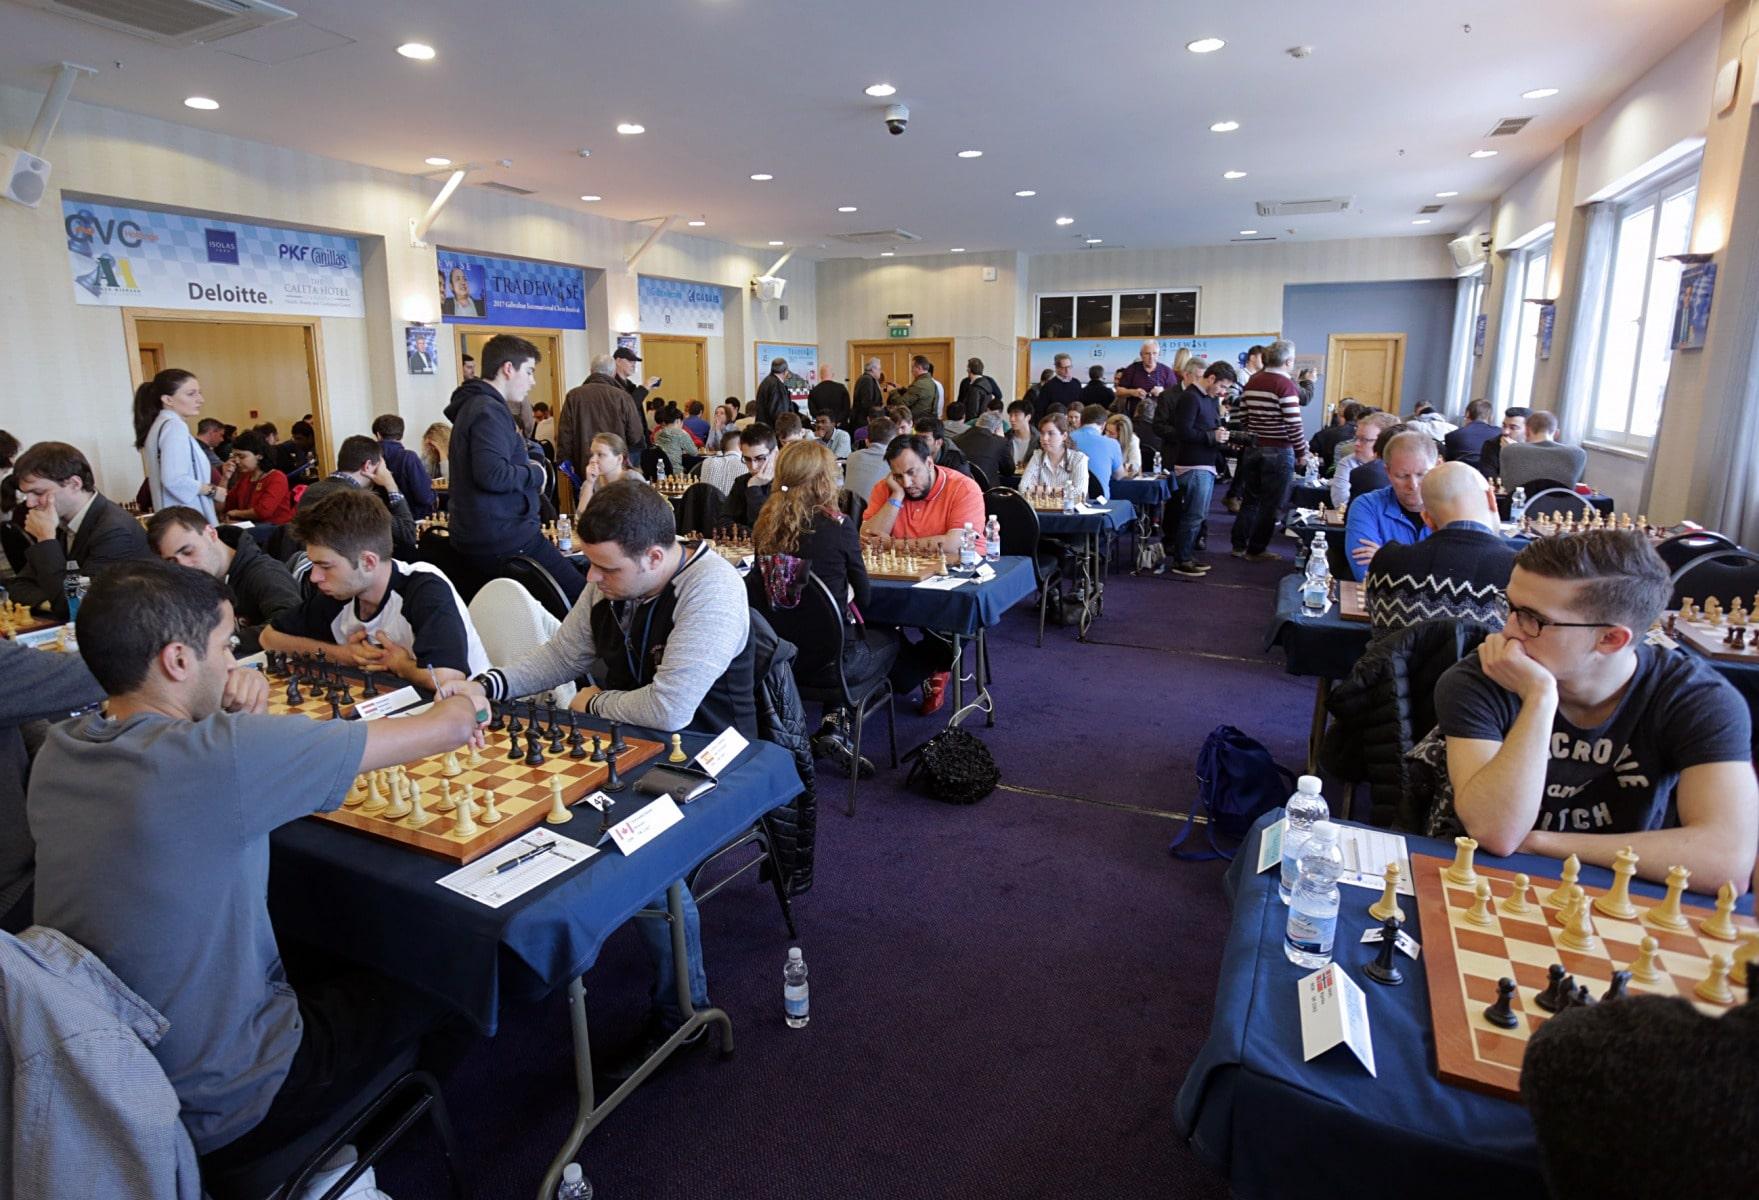 27-ene-17-fabin-picardo-visita-el-open-de-gibraltar-de-ajedrez-16_32175359800_o